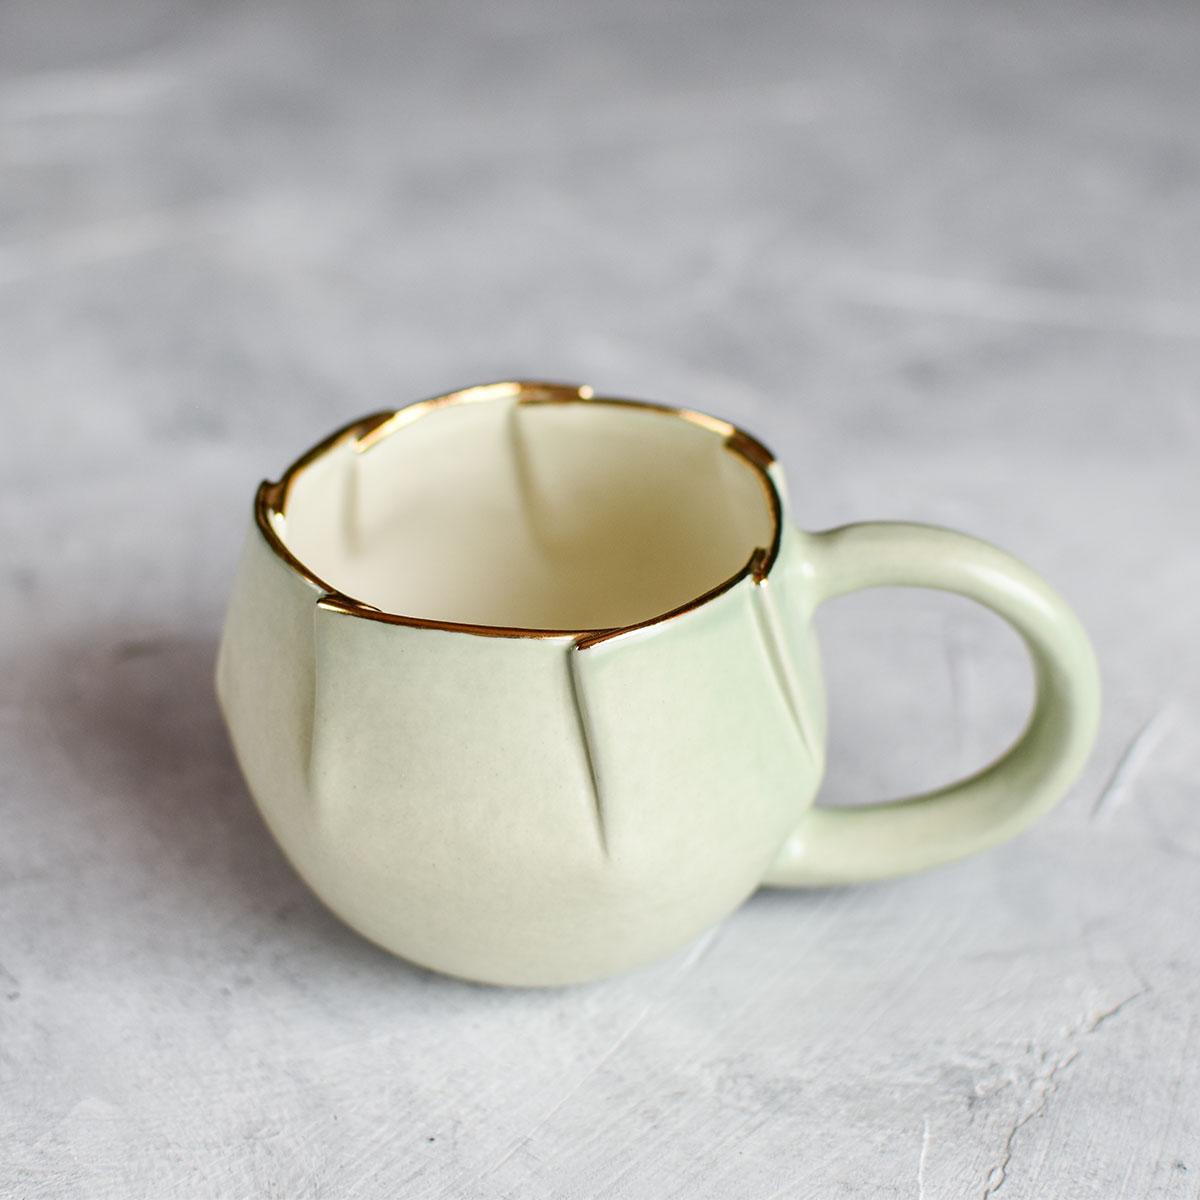 "картинка Чашка ручной работы ""ABC"" 4 - DishWishes.Ru"